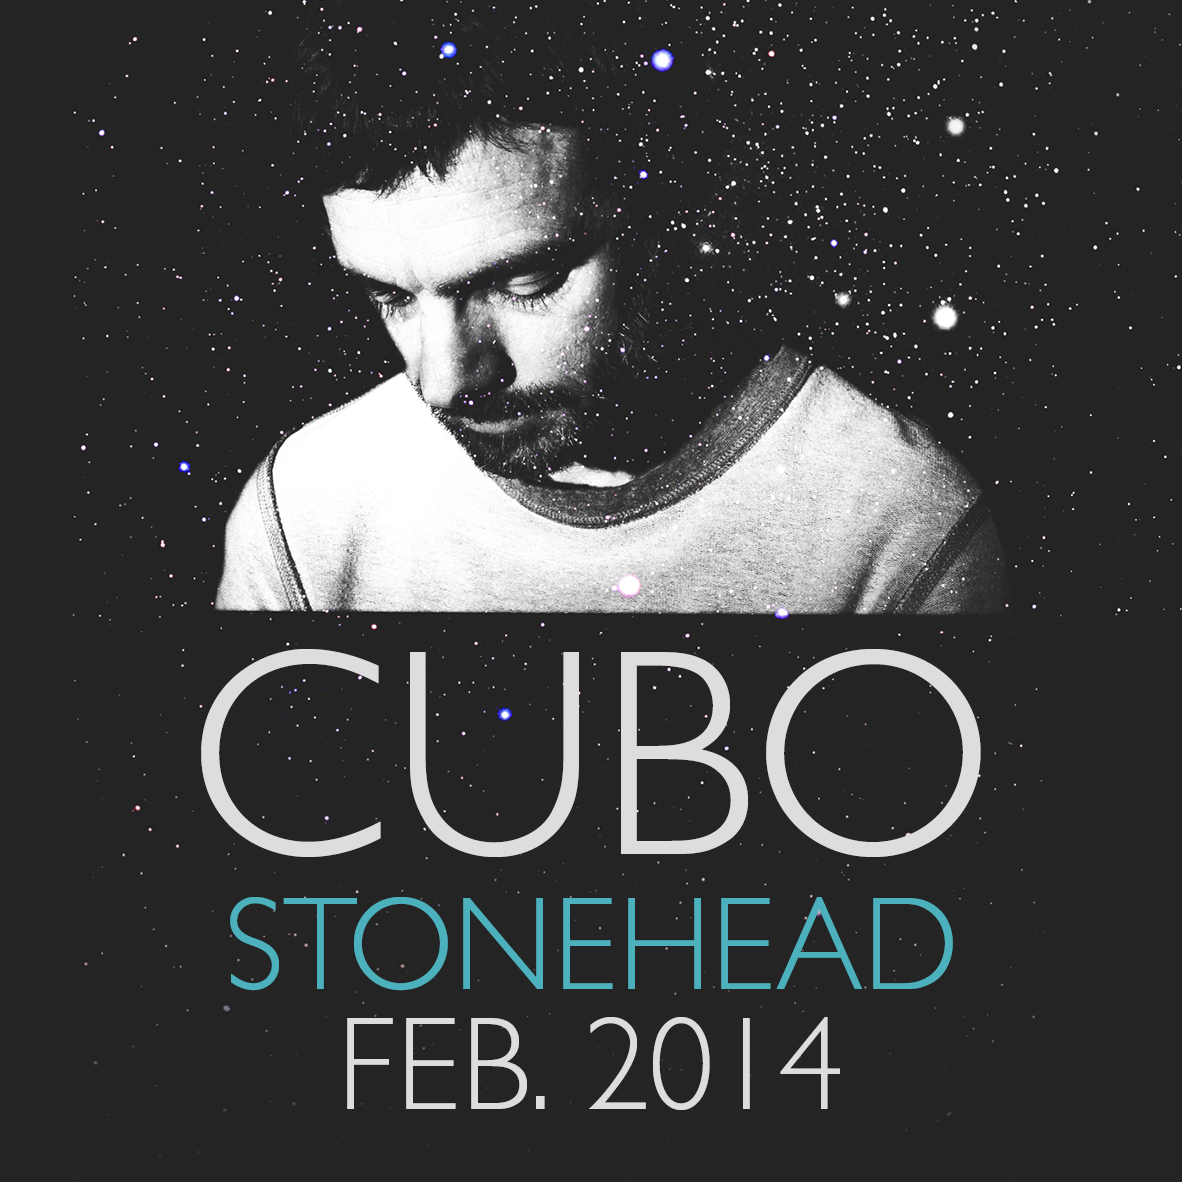 cubo_stonehead_feb14